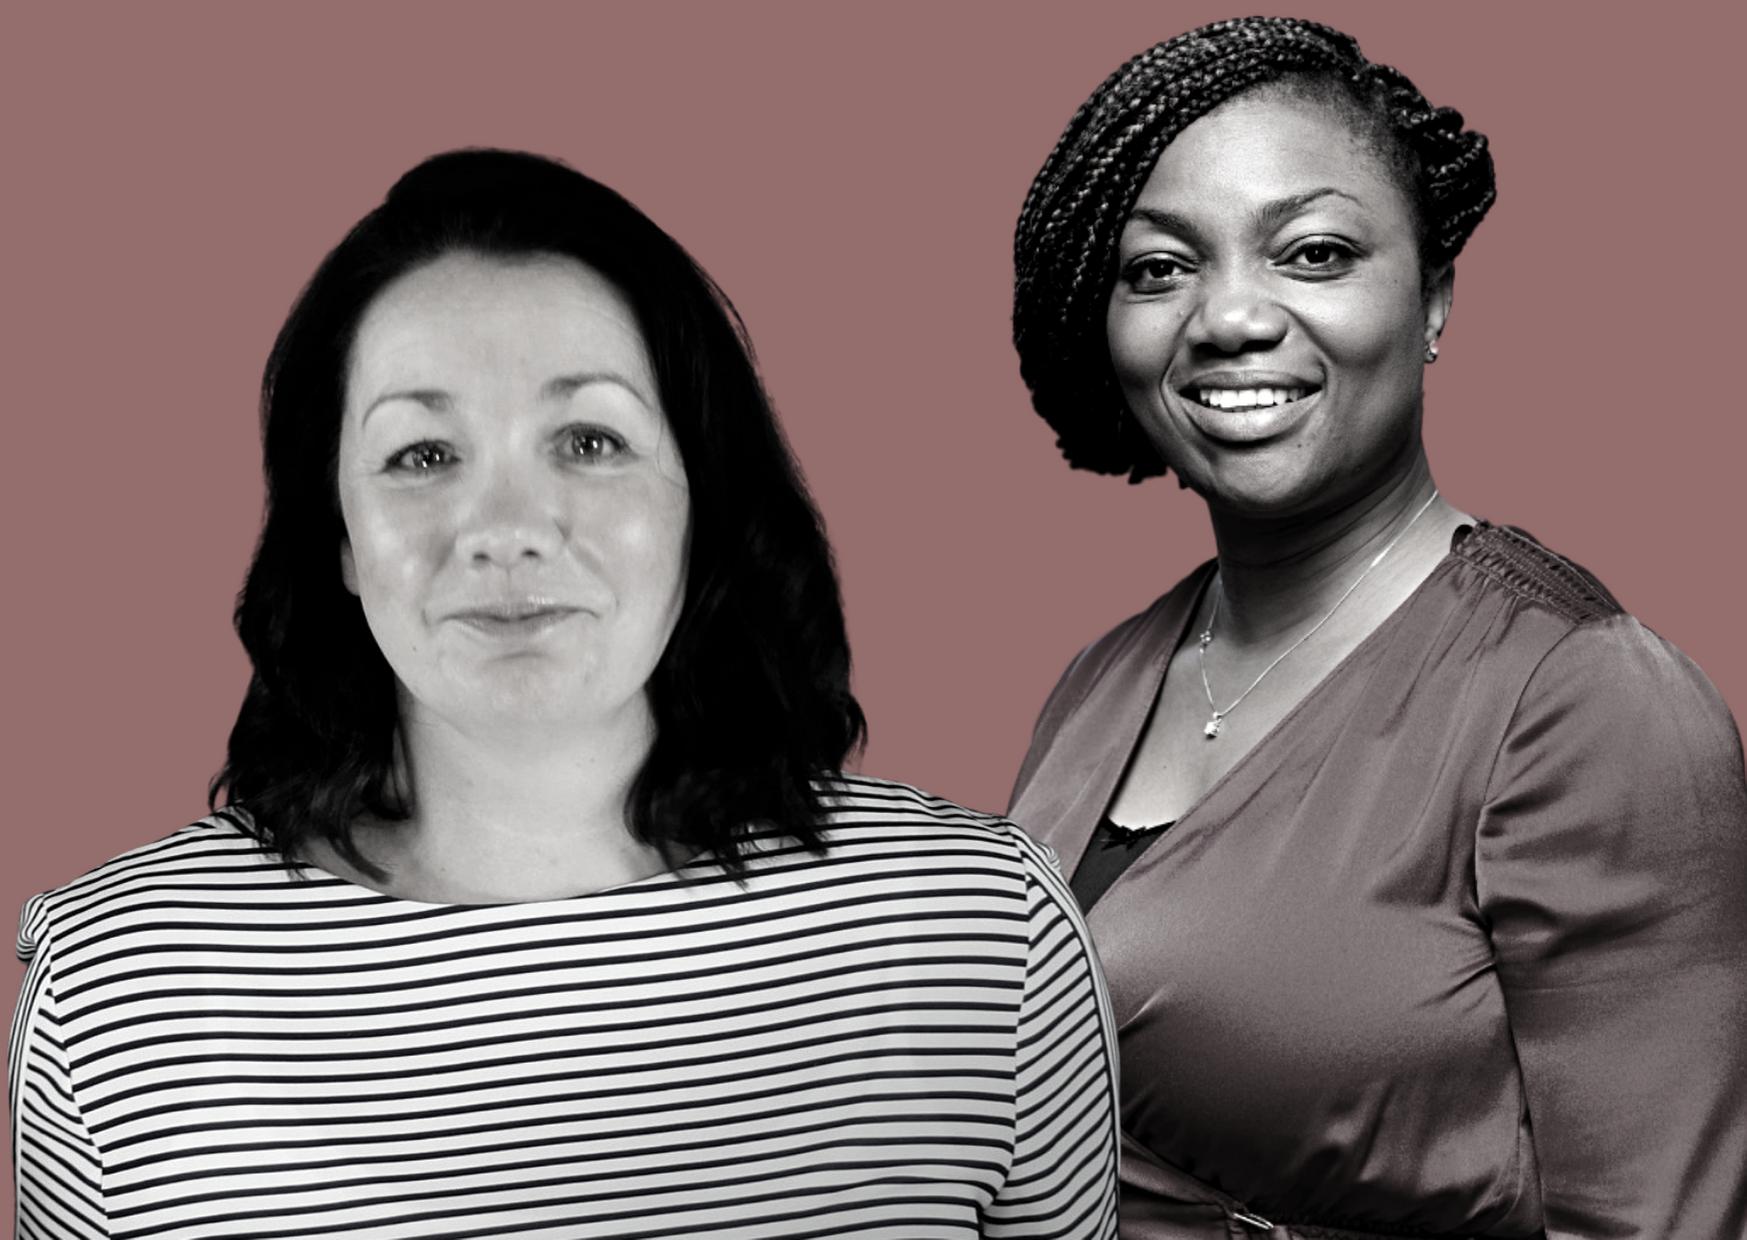 Female Founder Spotlight: Helen Darlington On 10 Steps To Improve Your Business Brand